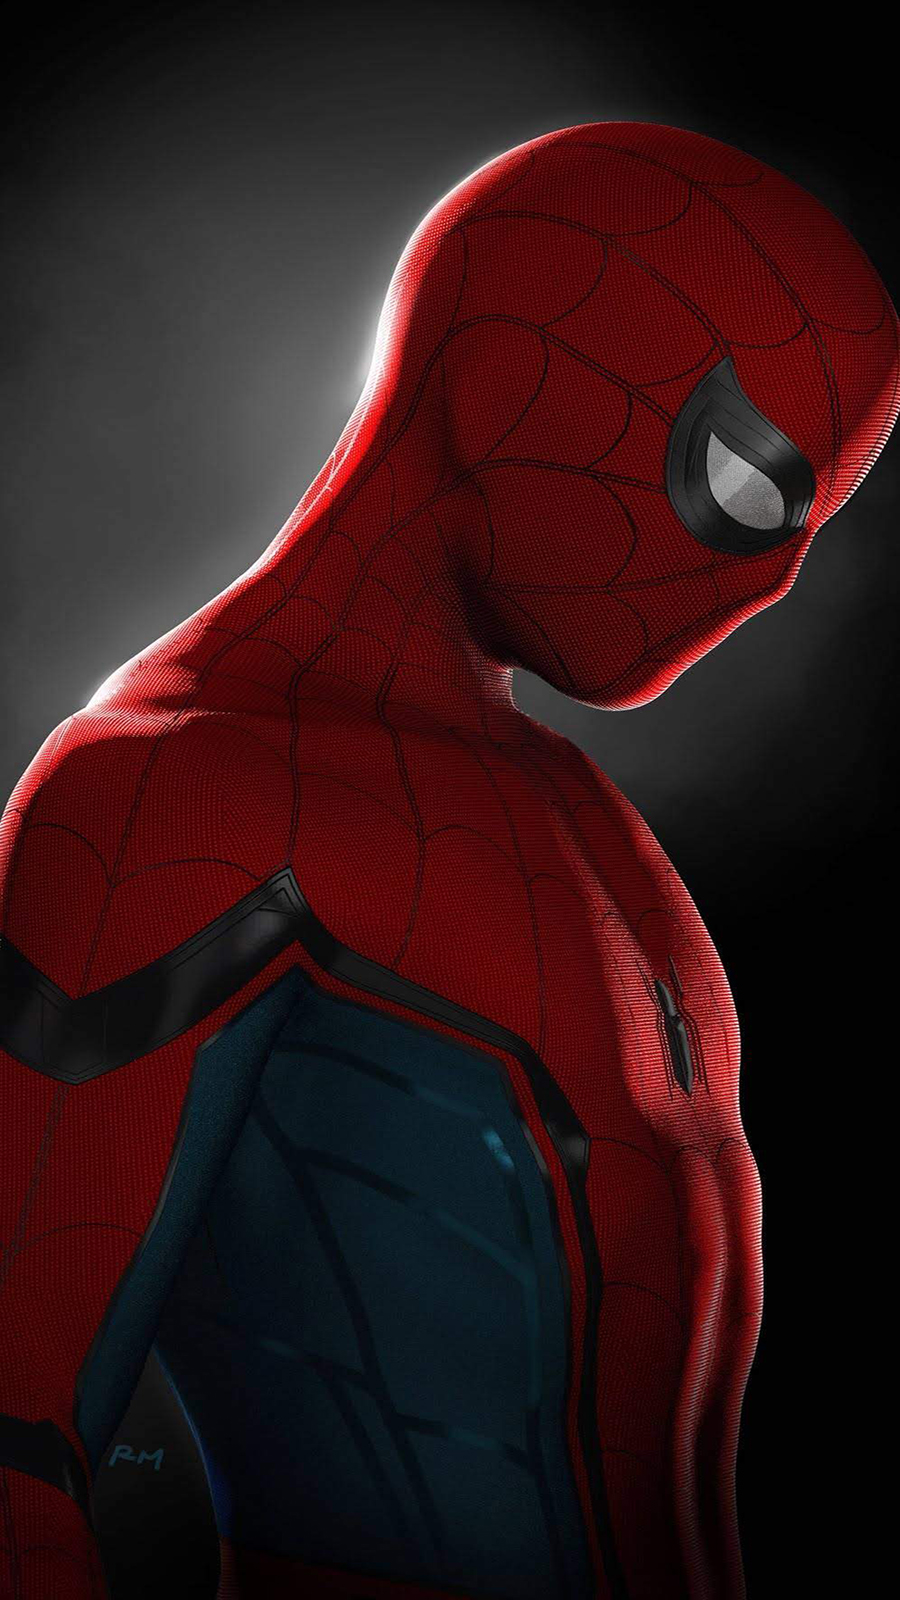 SPIDER MAN HD Wallpapers Free Download for Phone & Desktop (3)